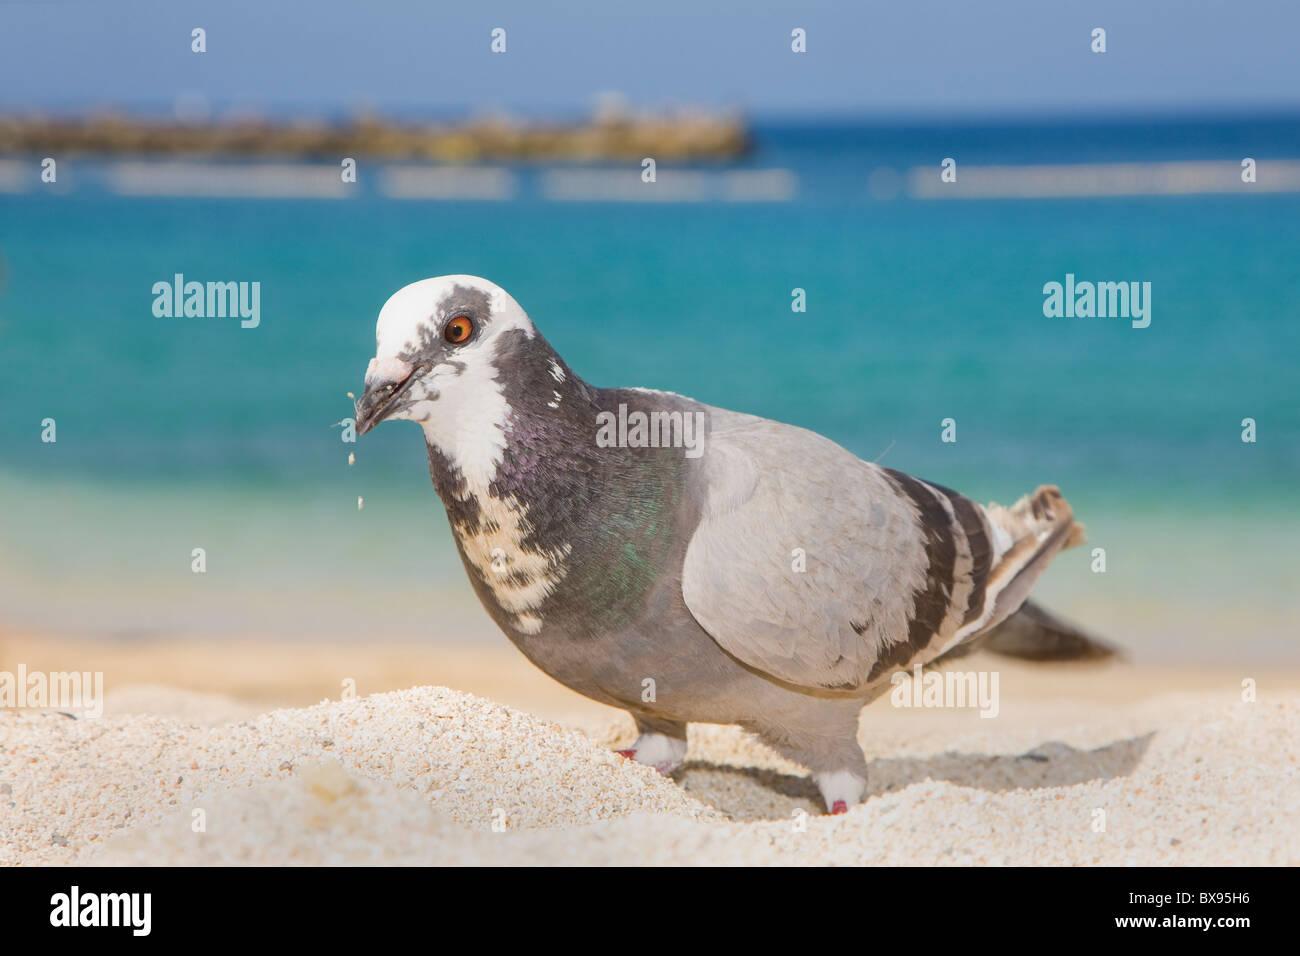 Taube am Strand Stockbild